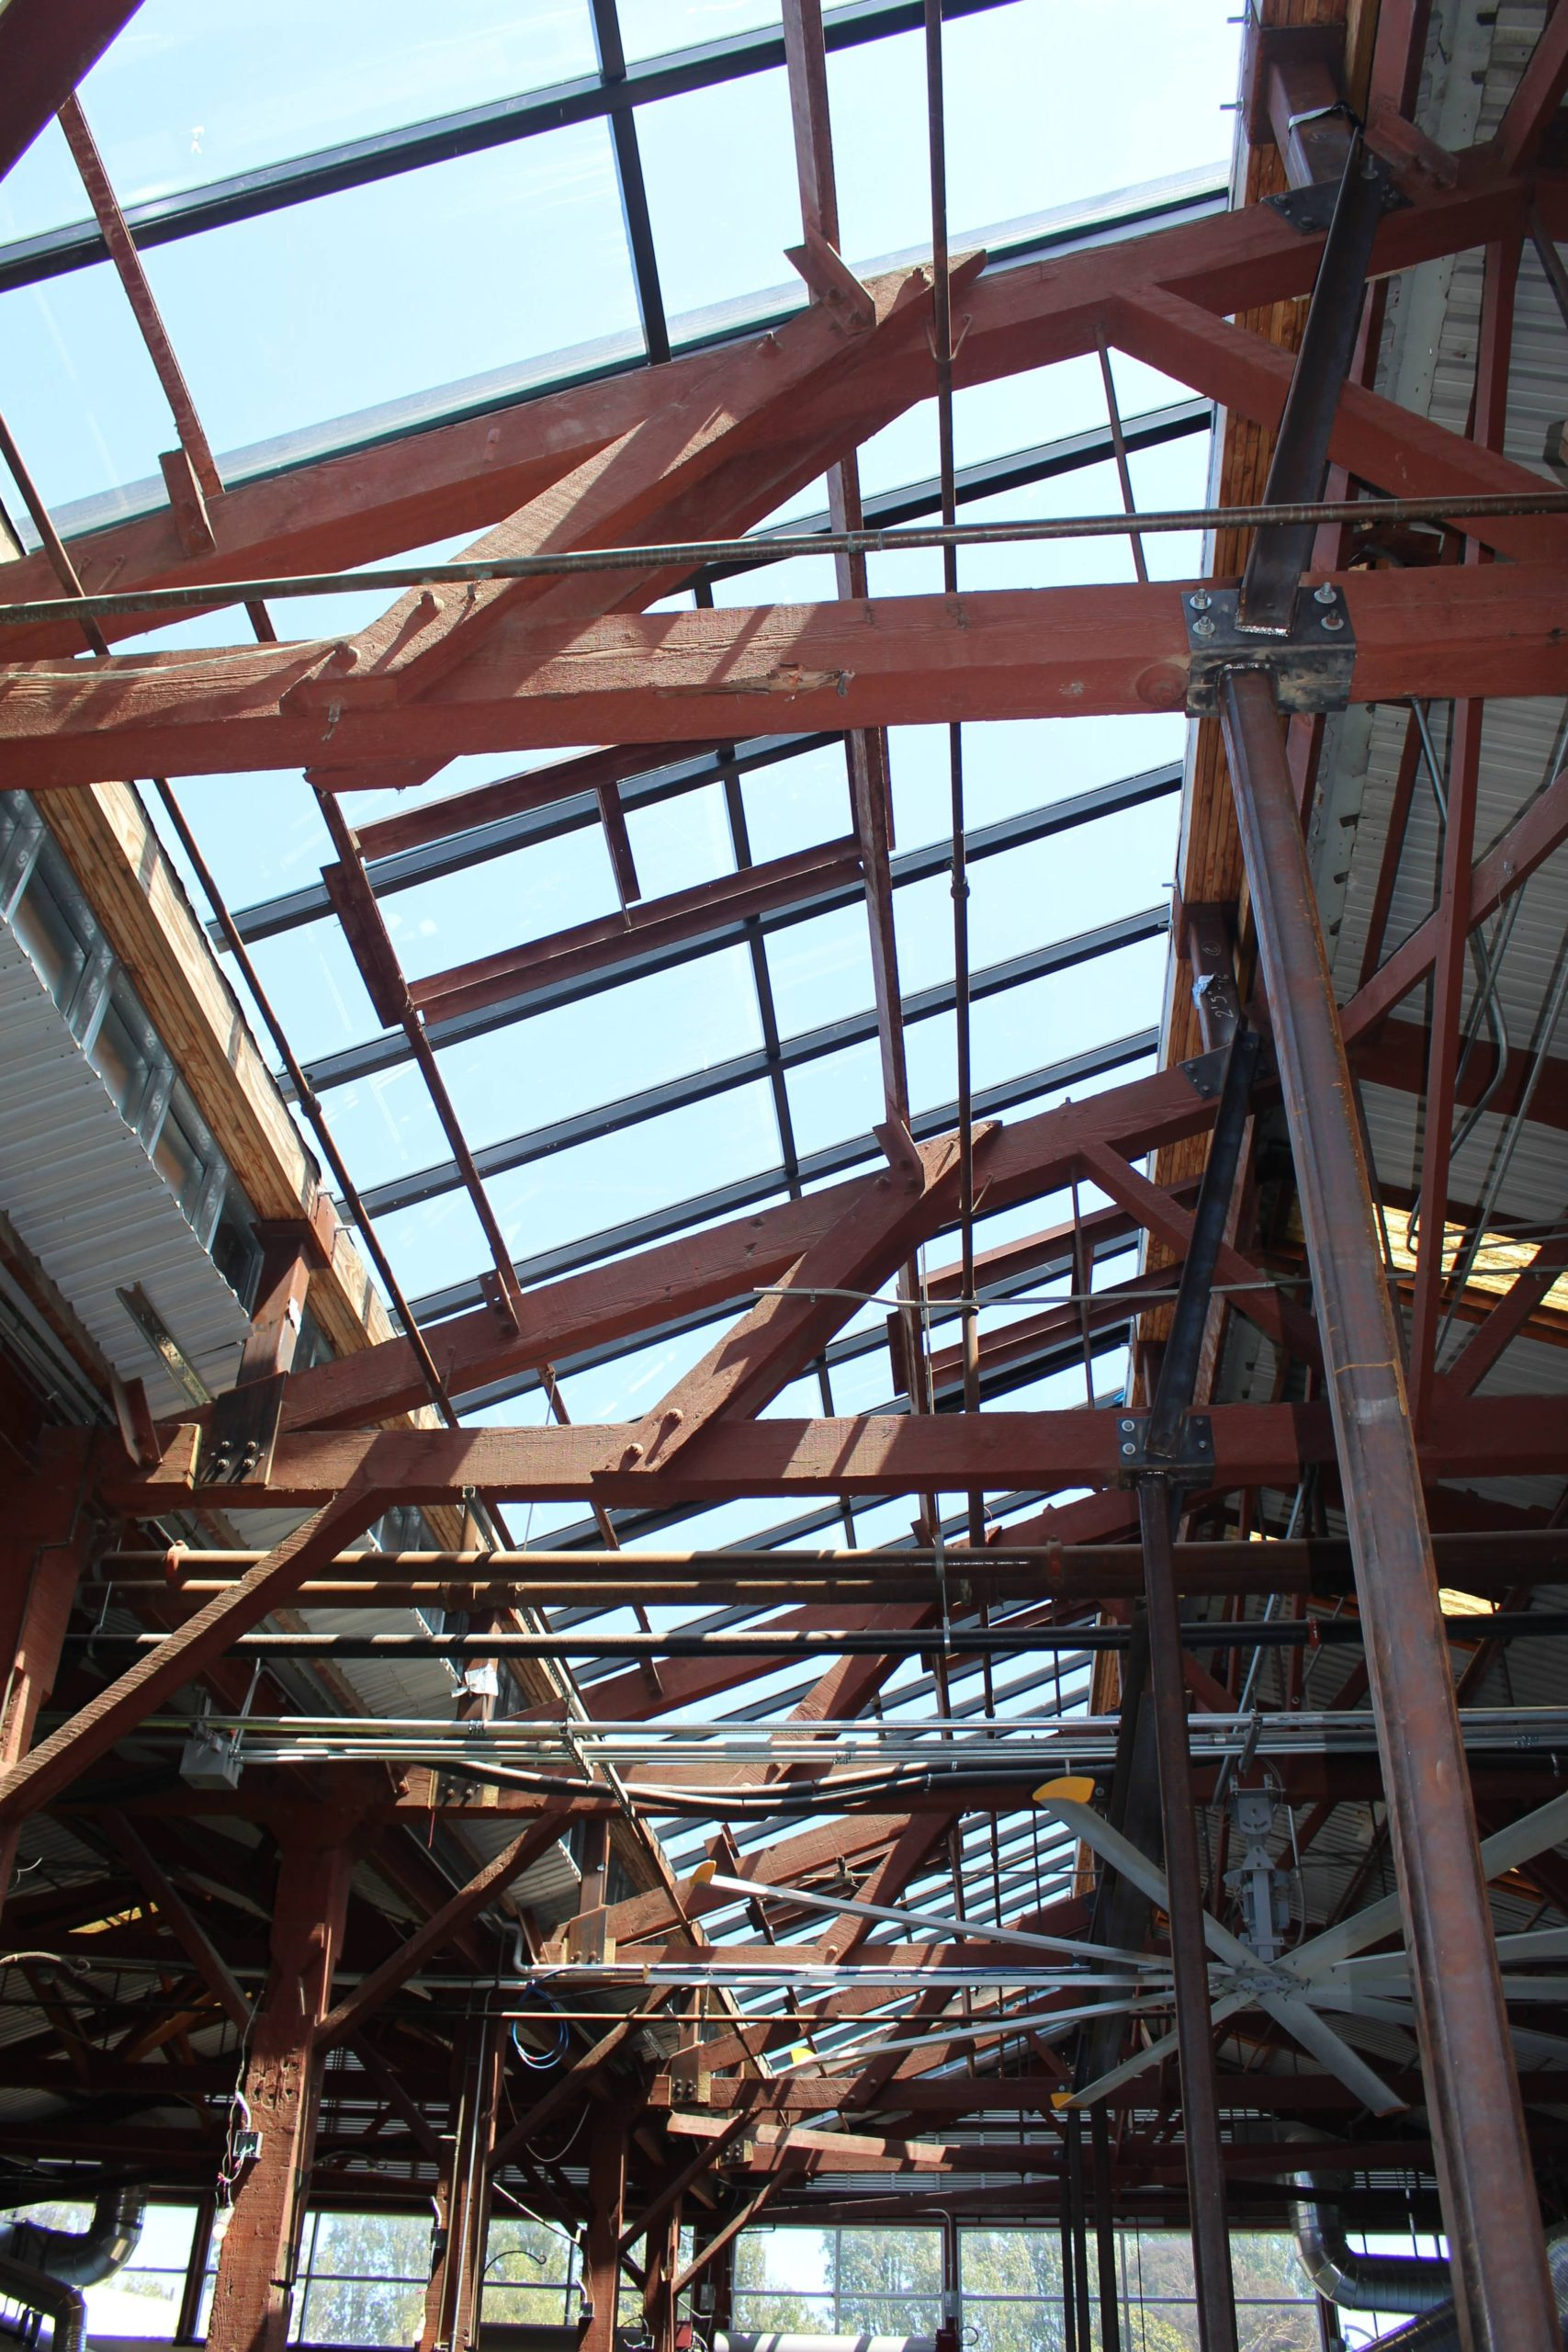 retractable roof - Meadow